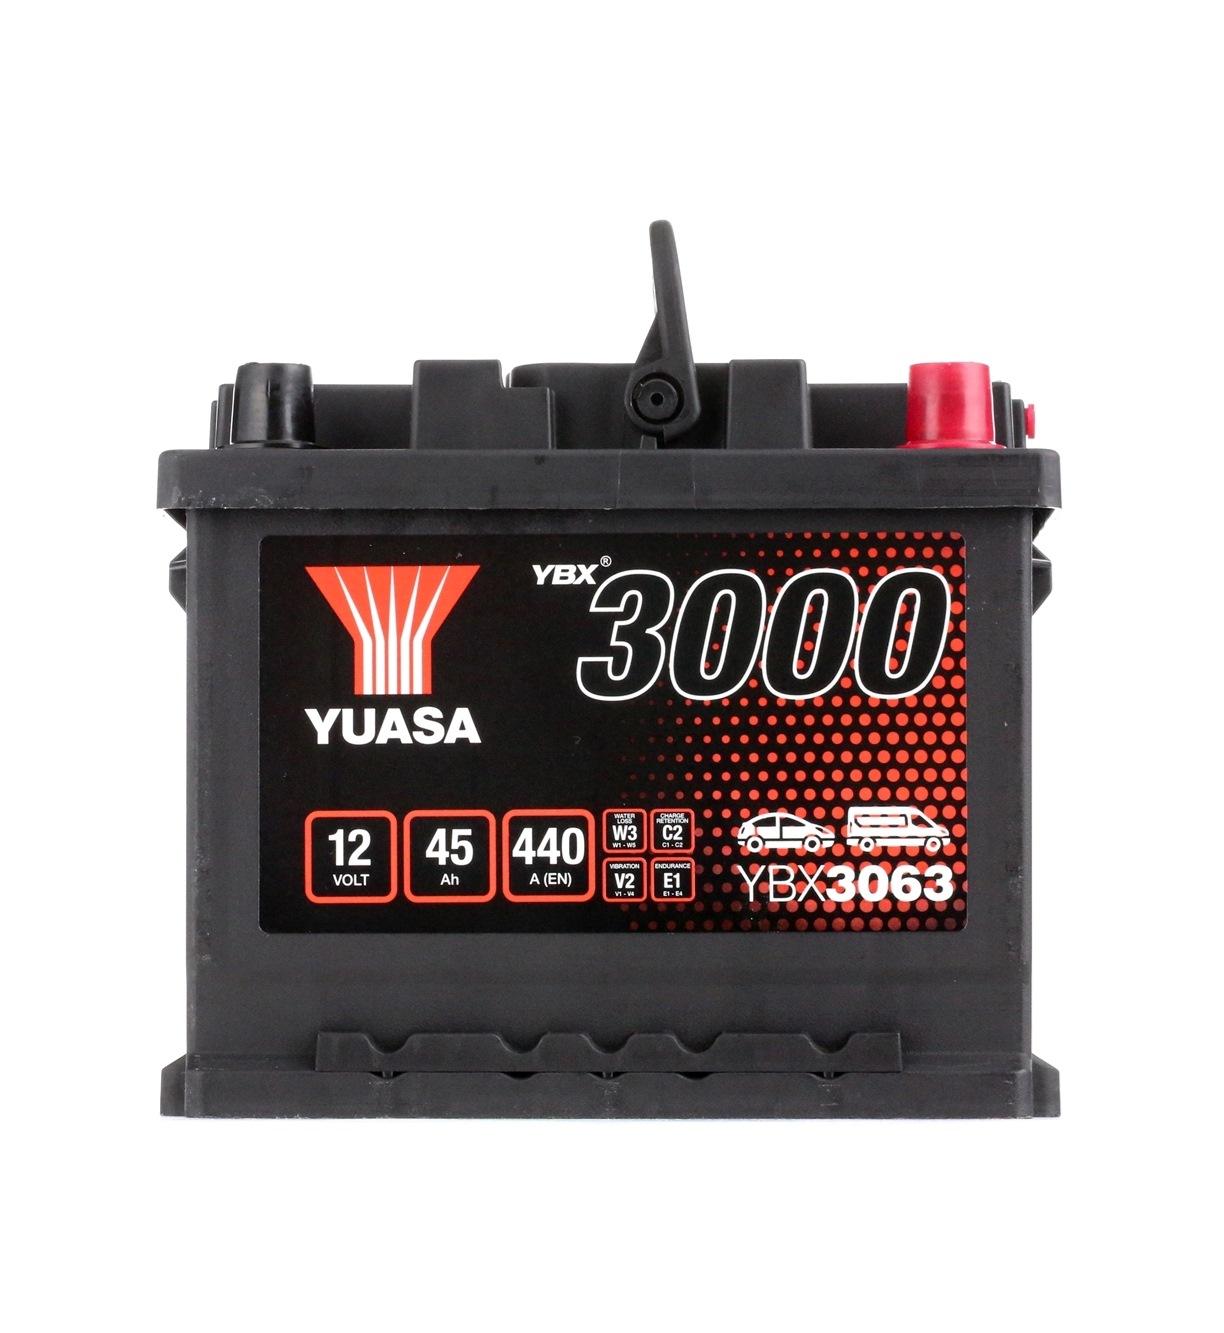 Batterie YUASA YBX3063 Bewertung